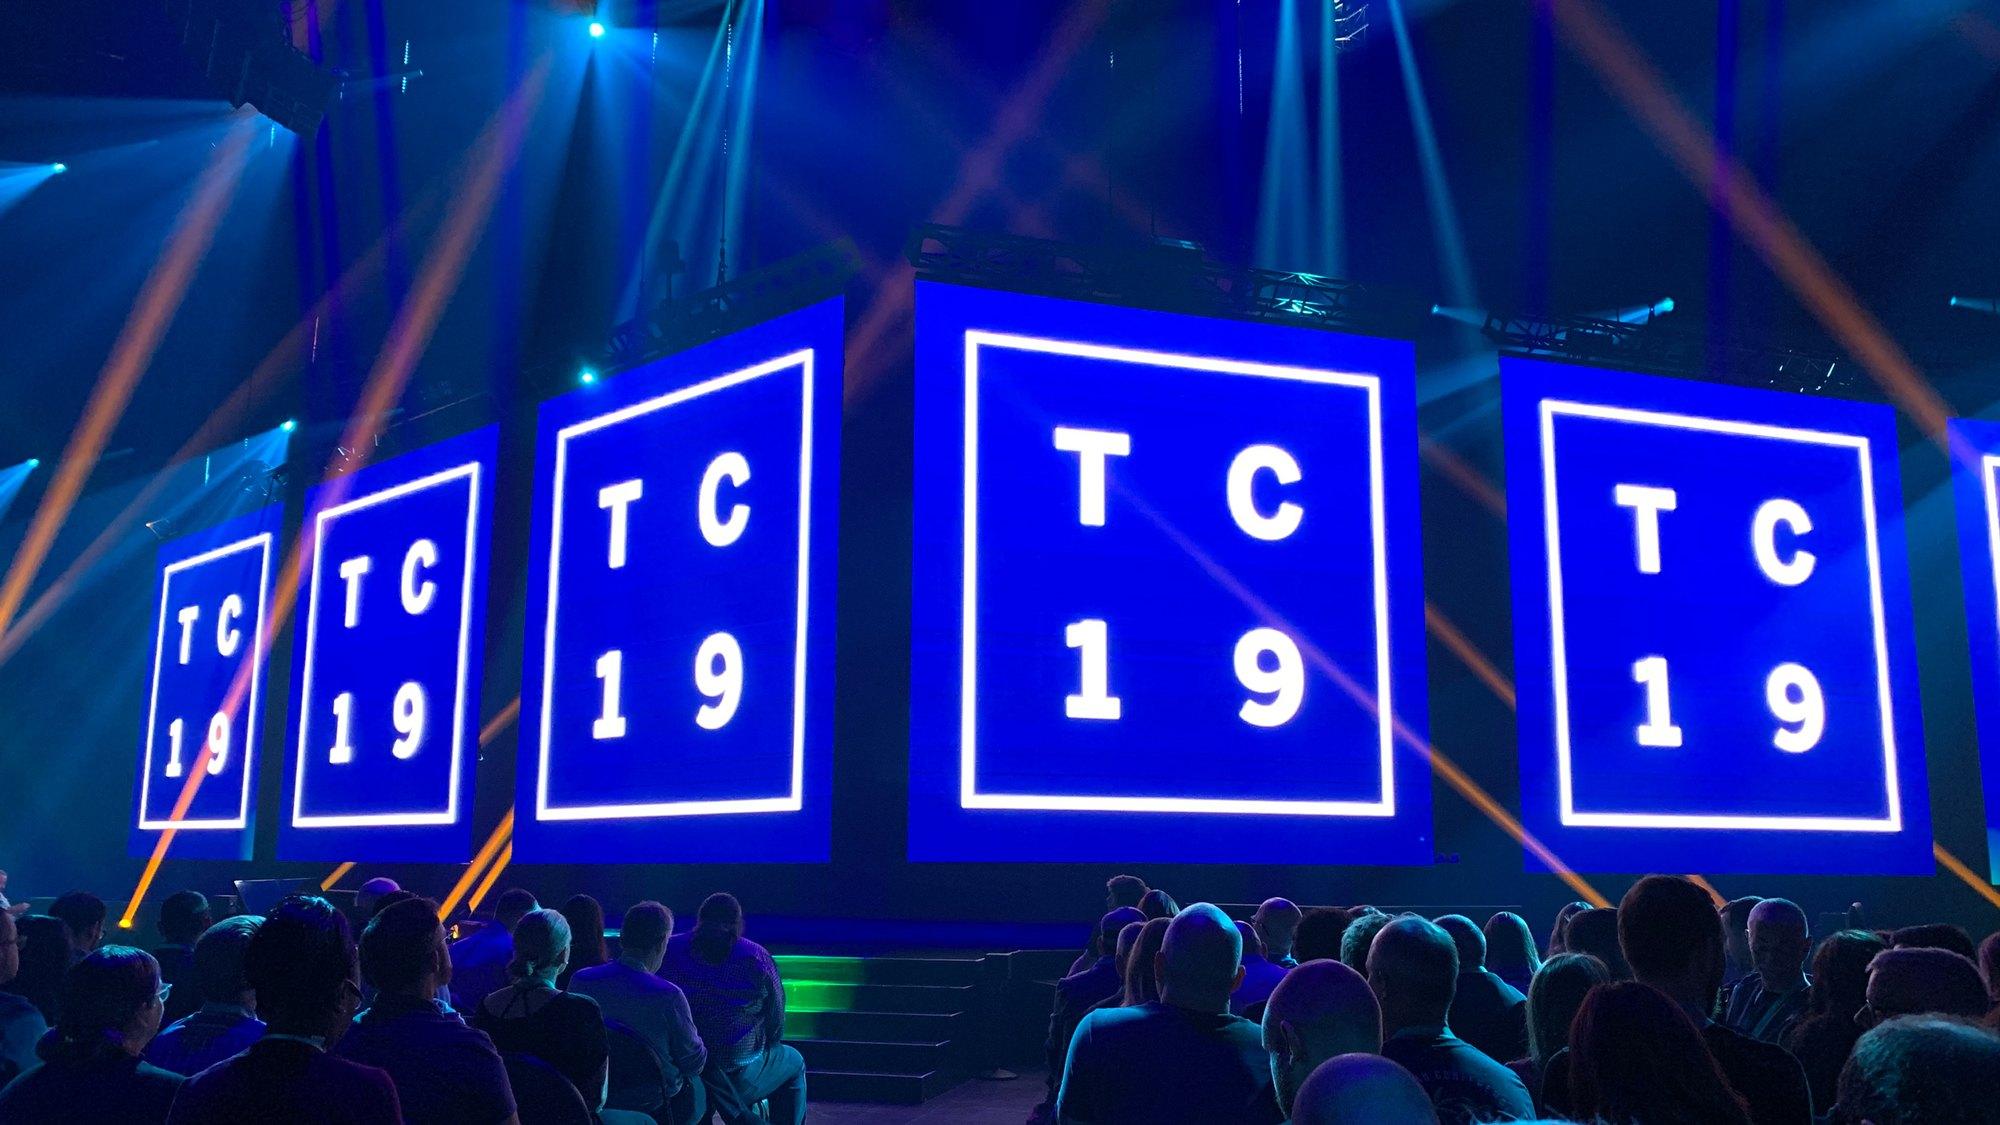 Tableau Conference 2019 keynote